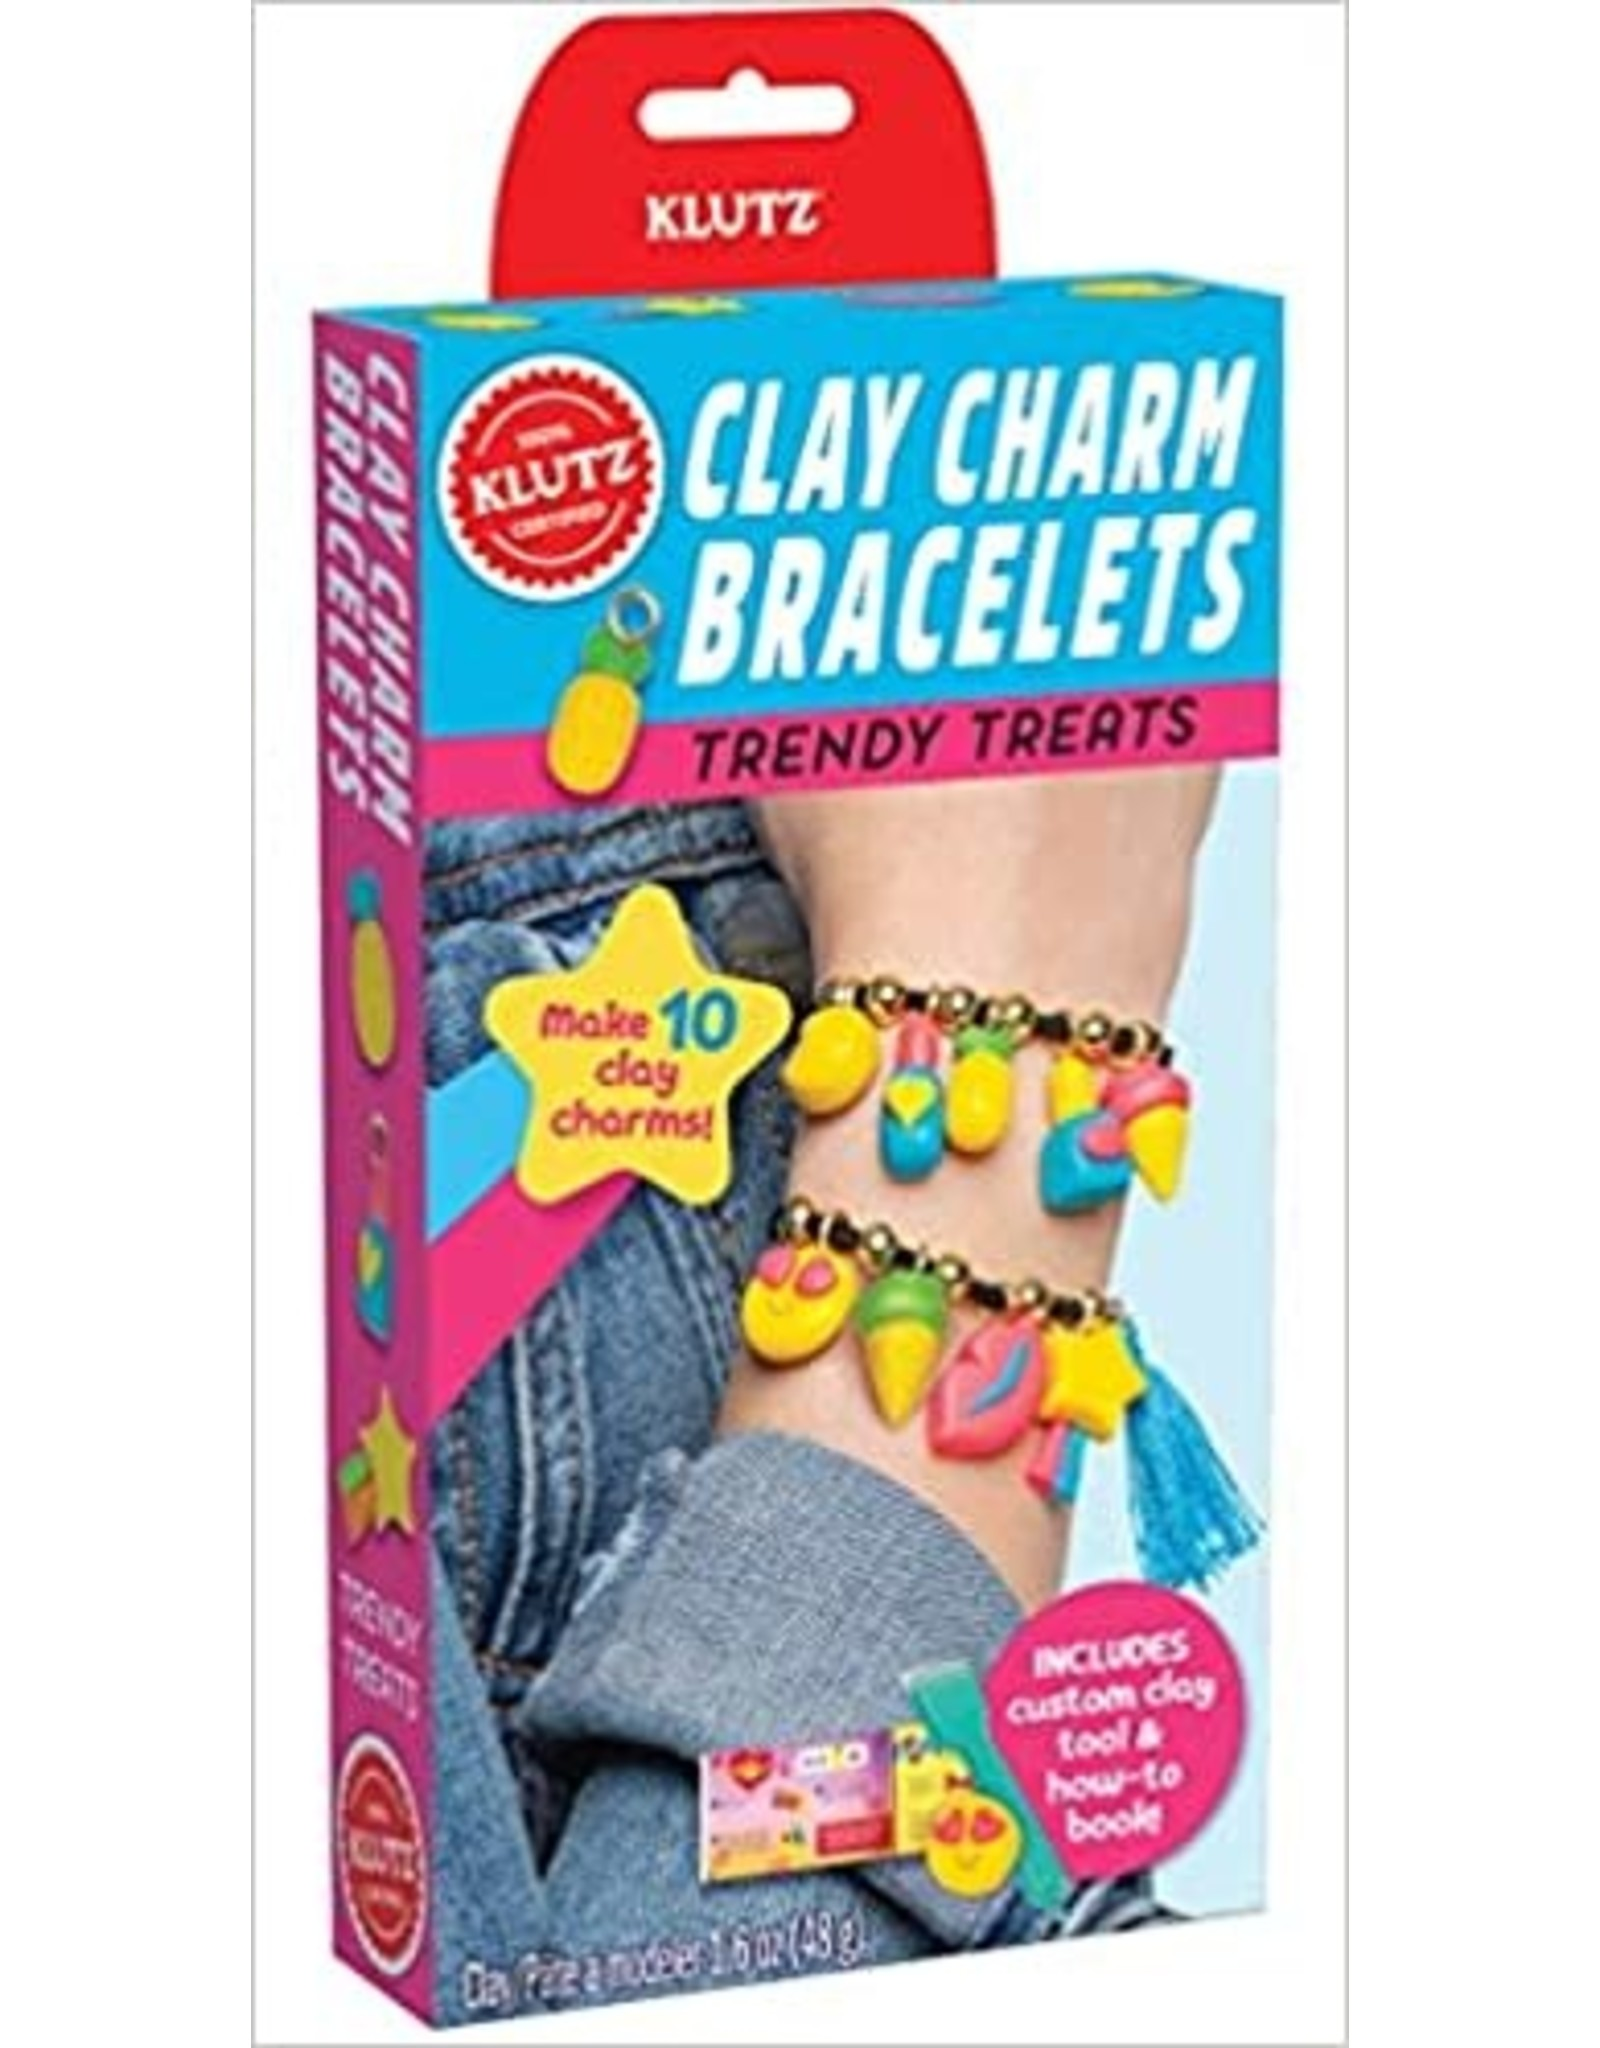 Klutz Klutz: Clay Charm Bracelets Trendy Treats